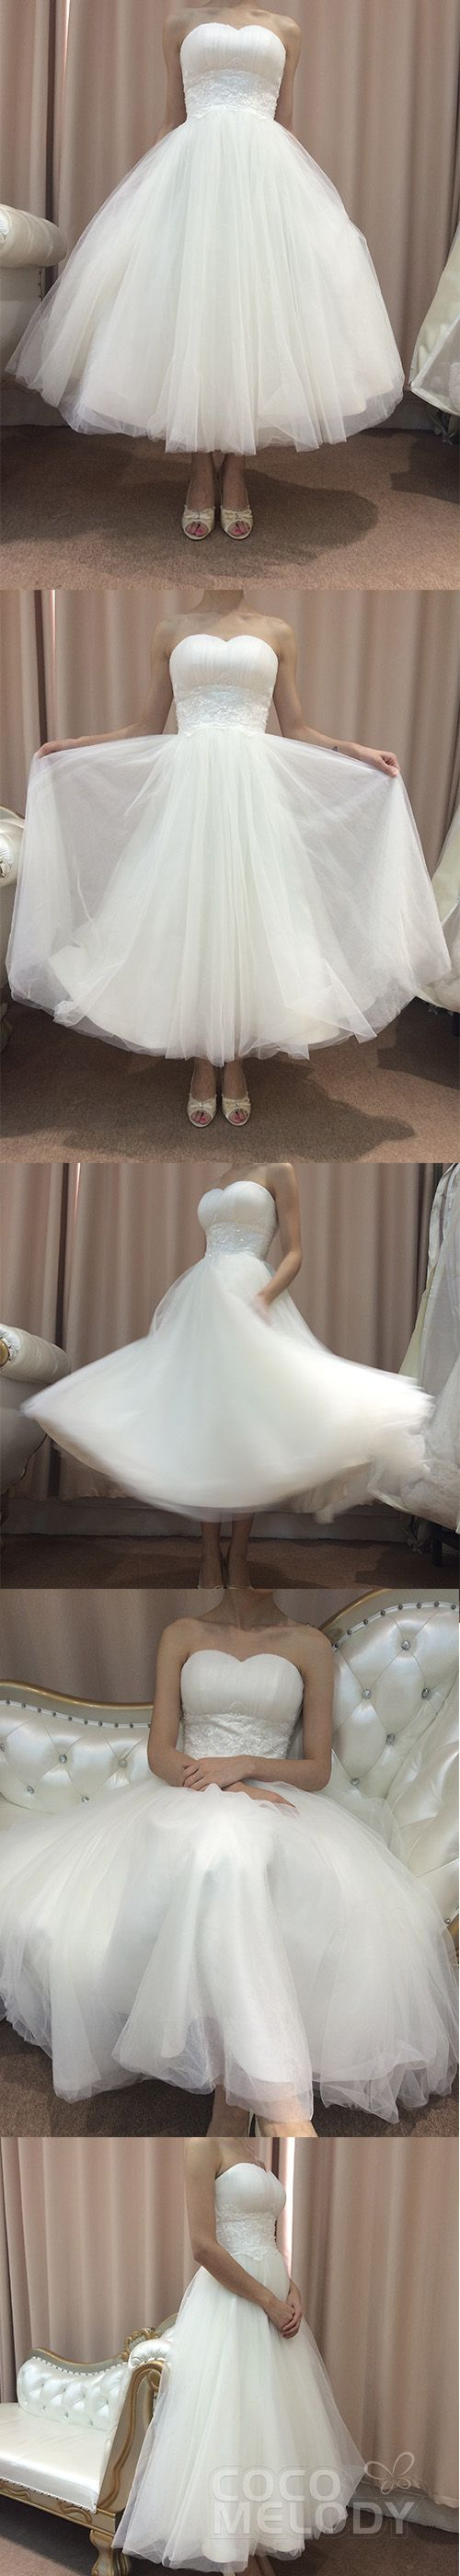 Lovely and Stunning Ankle Sleeveless Wedding Dress. #CWZA13001 #weddingdresses #customdresses #cocomelody